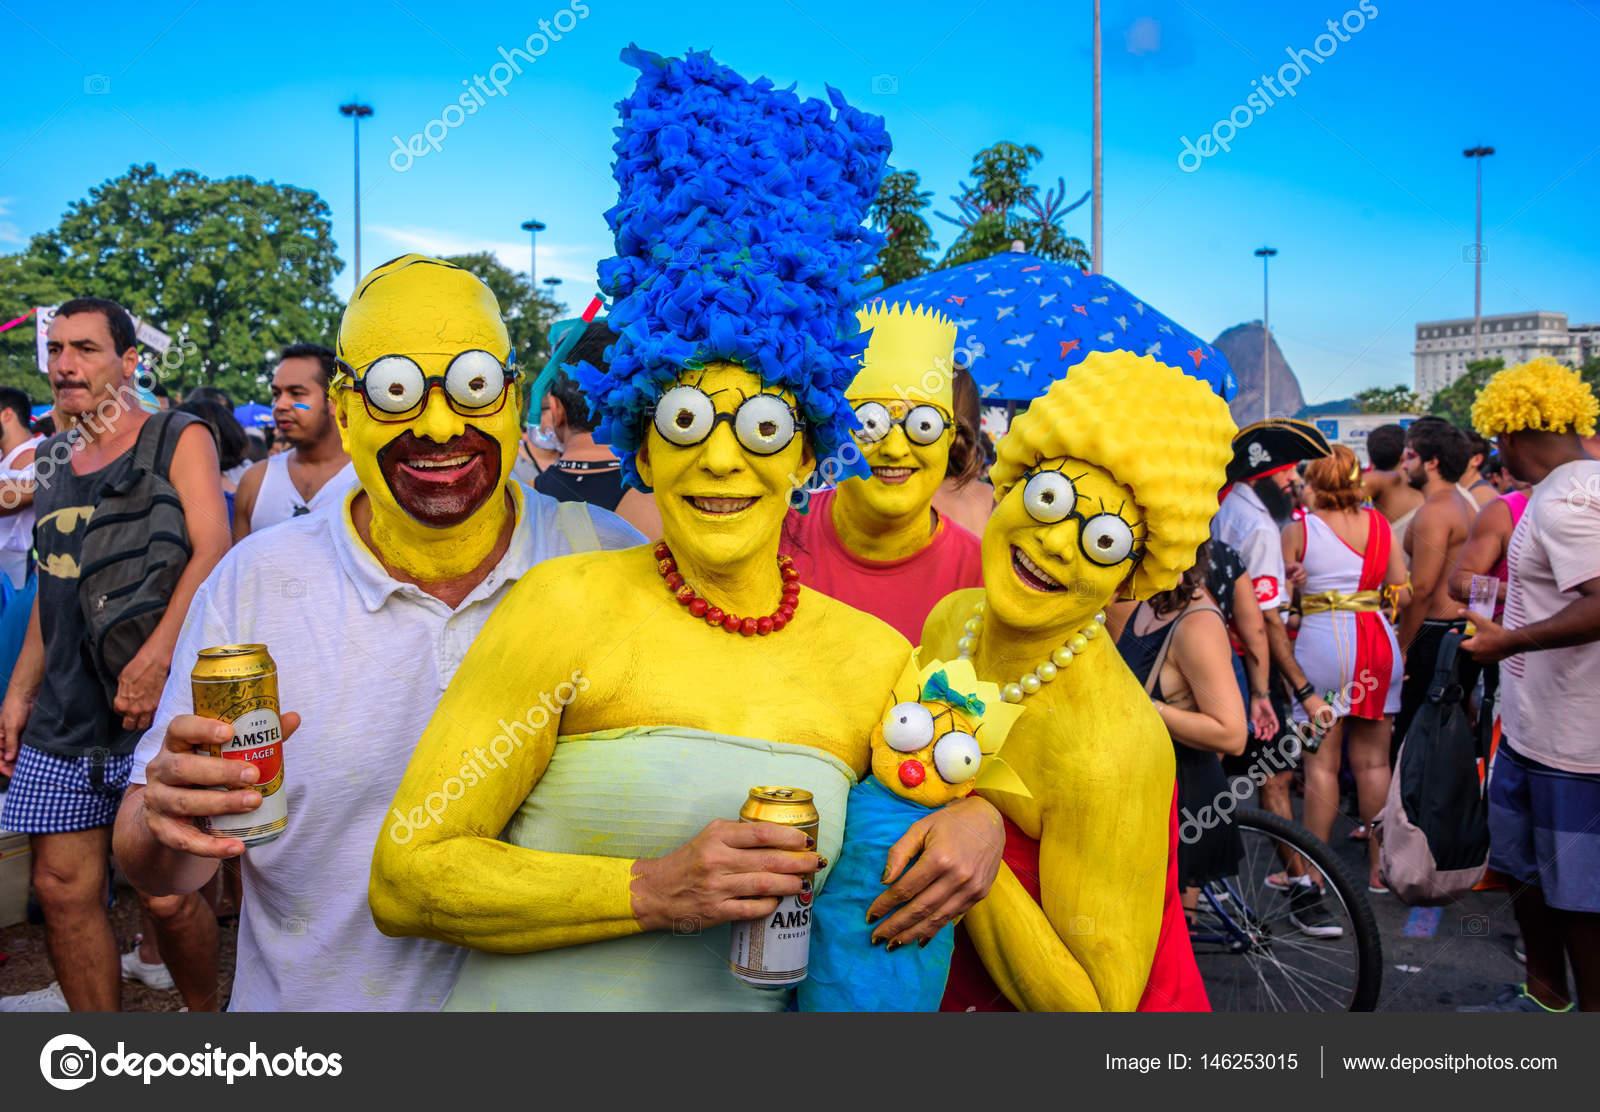 Imagenes La Familia Simpson Disfraces Familia De Los Simpsons - Disfraces-simpsons